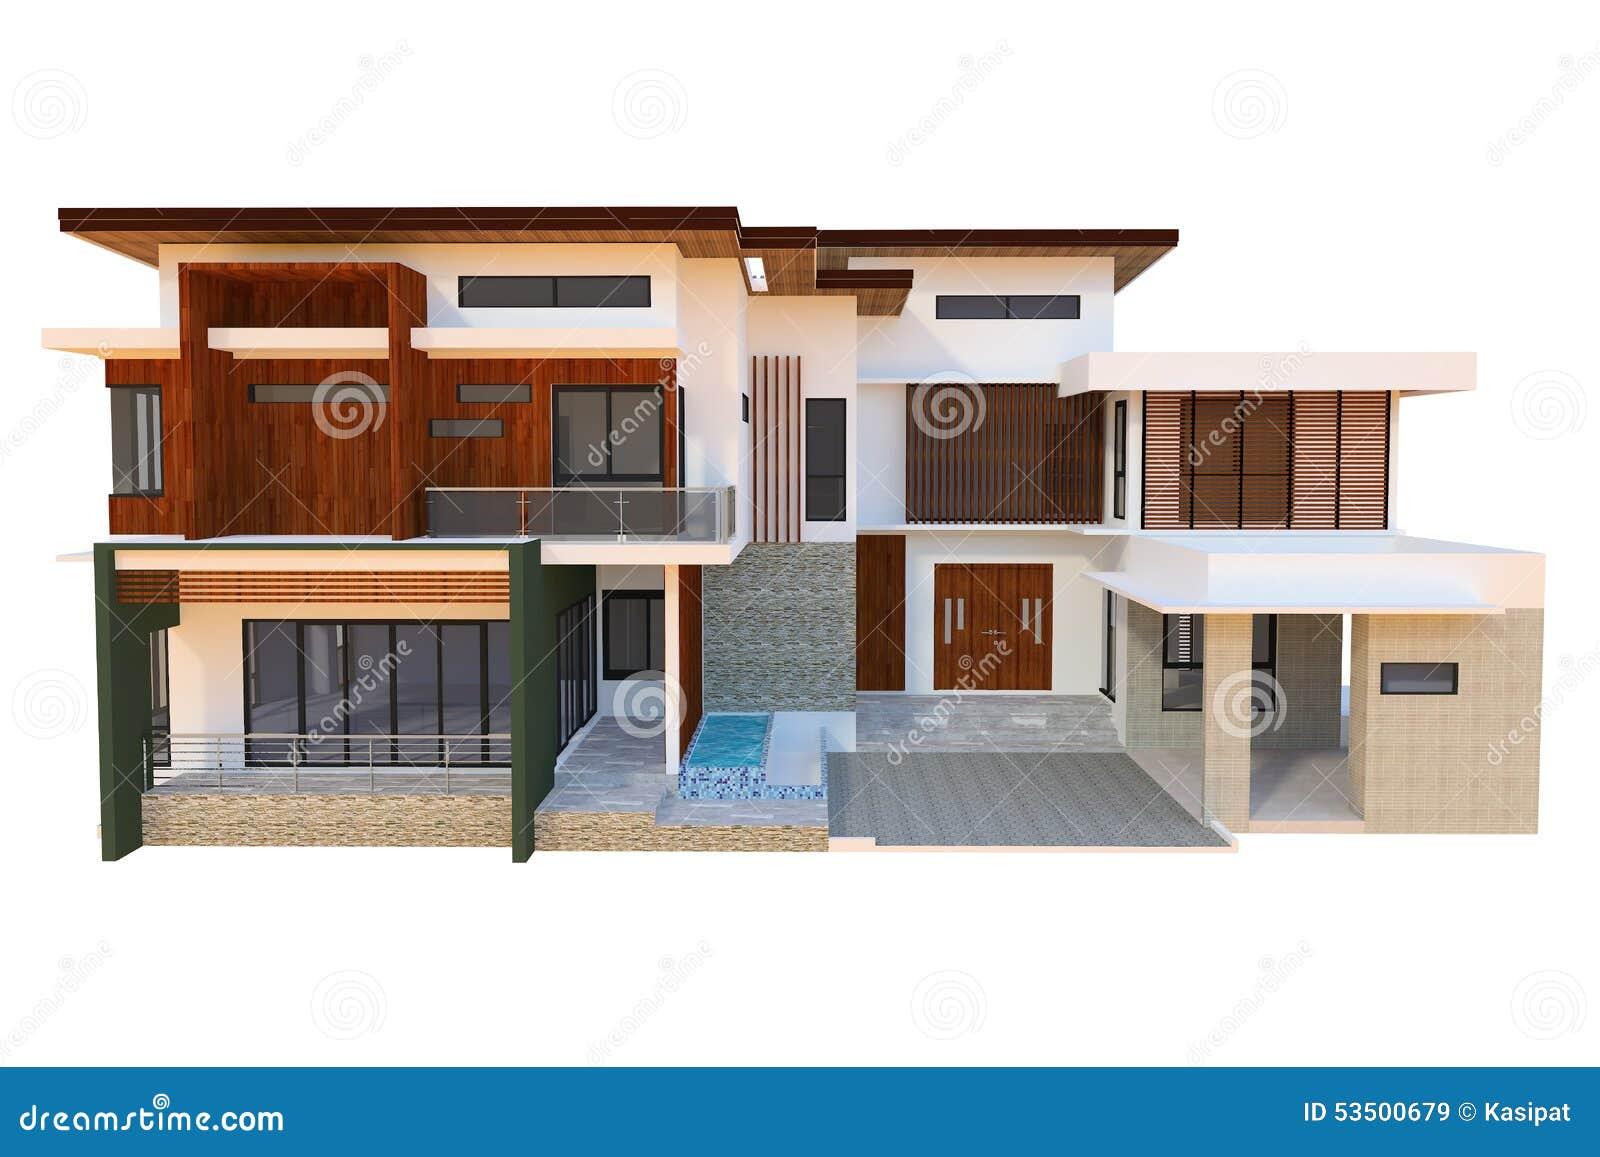 modern home design stock illustration image 53500679 house plan top view interior design stock illustration